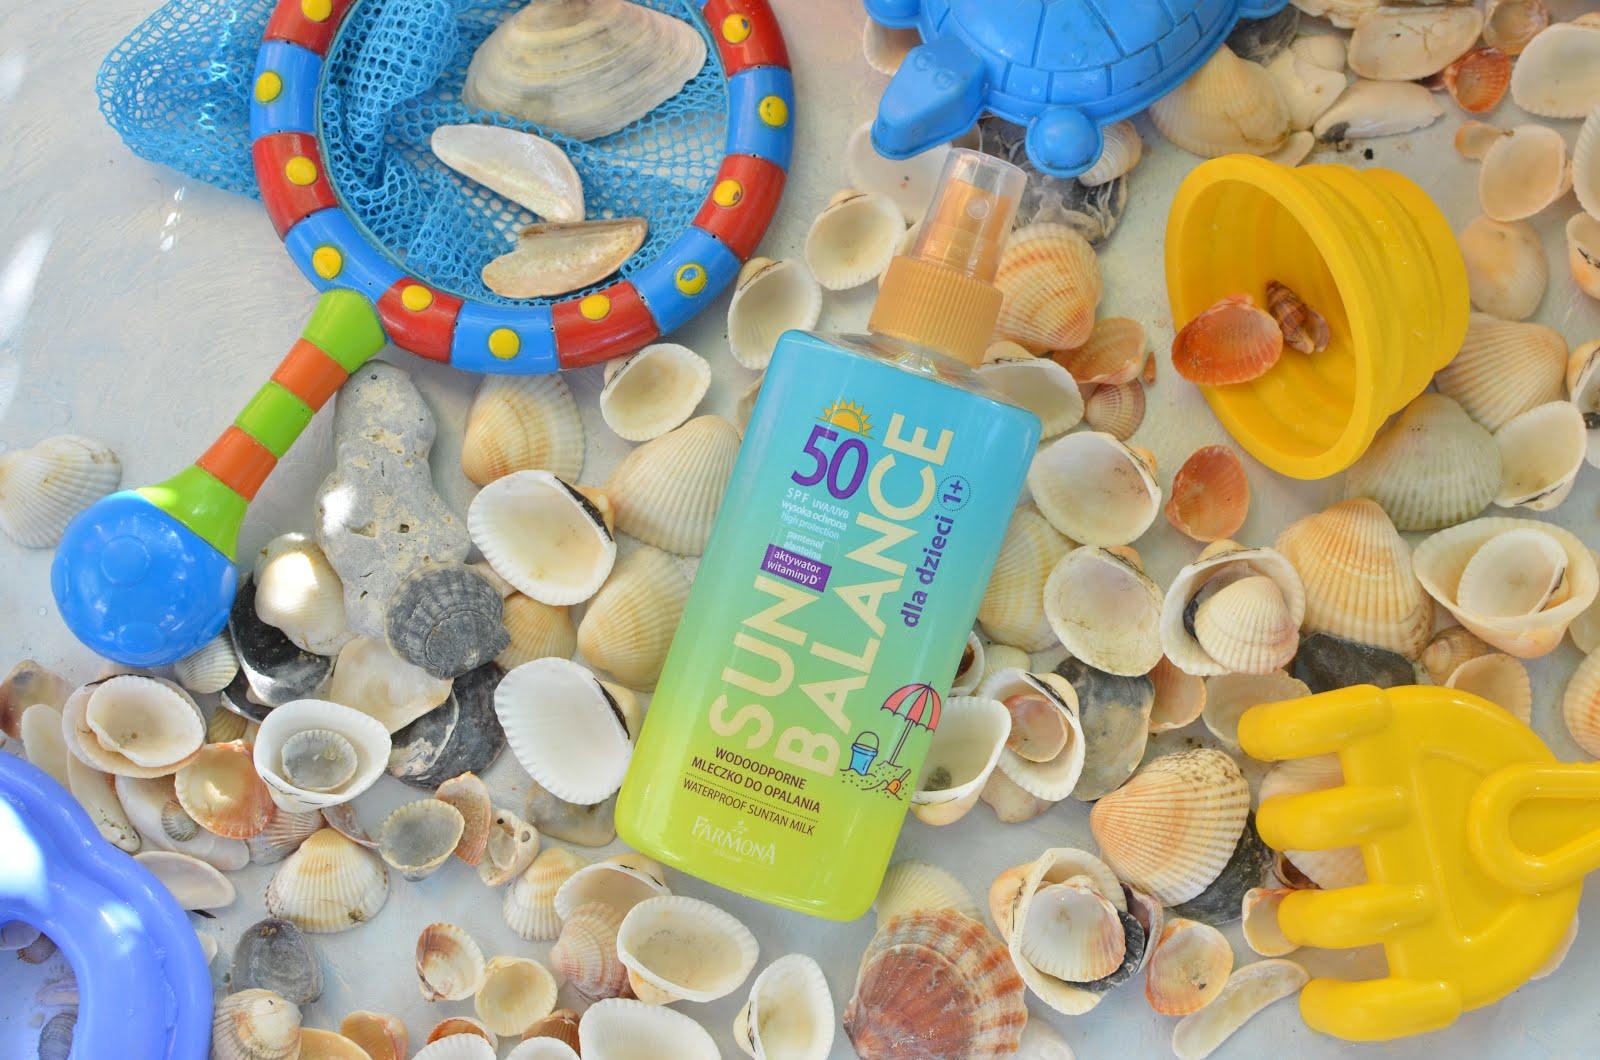 Farmona Sun Balance Milk SPF 50 Водостойкое молочко для детей